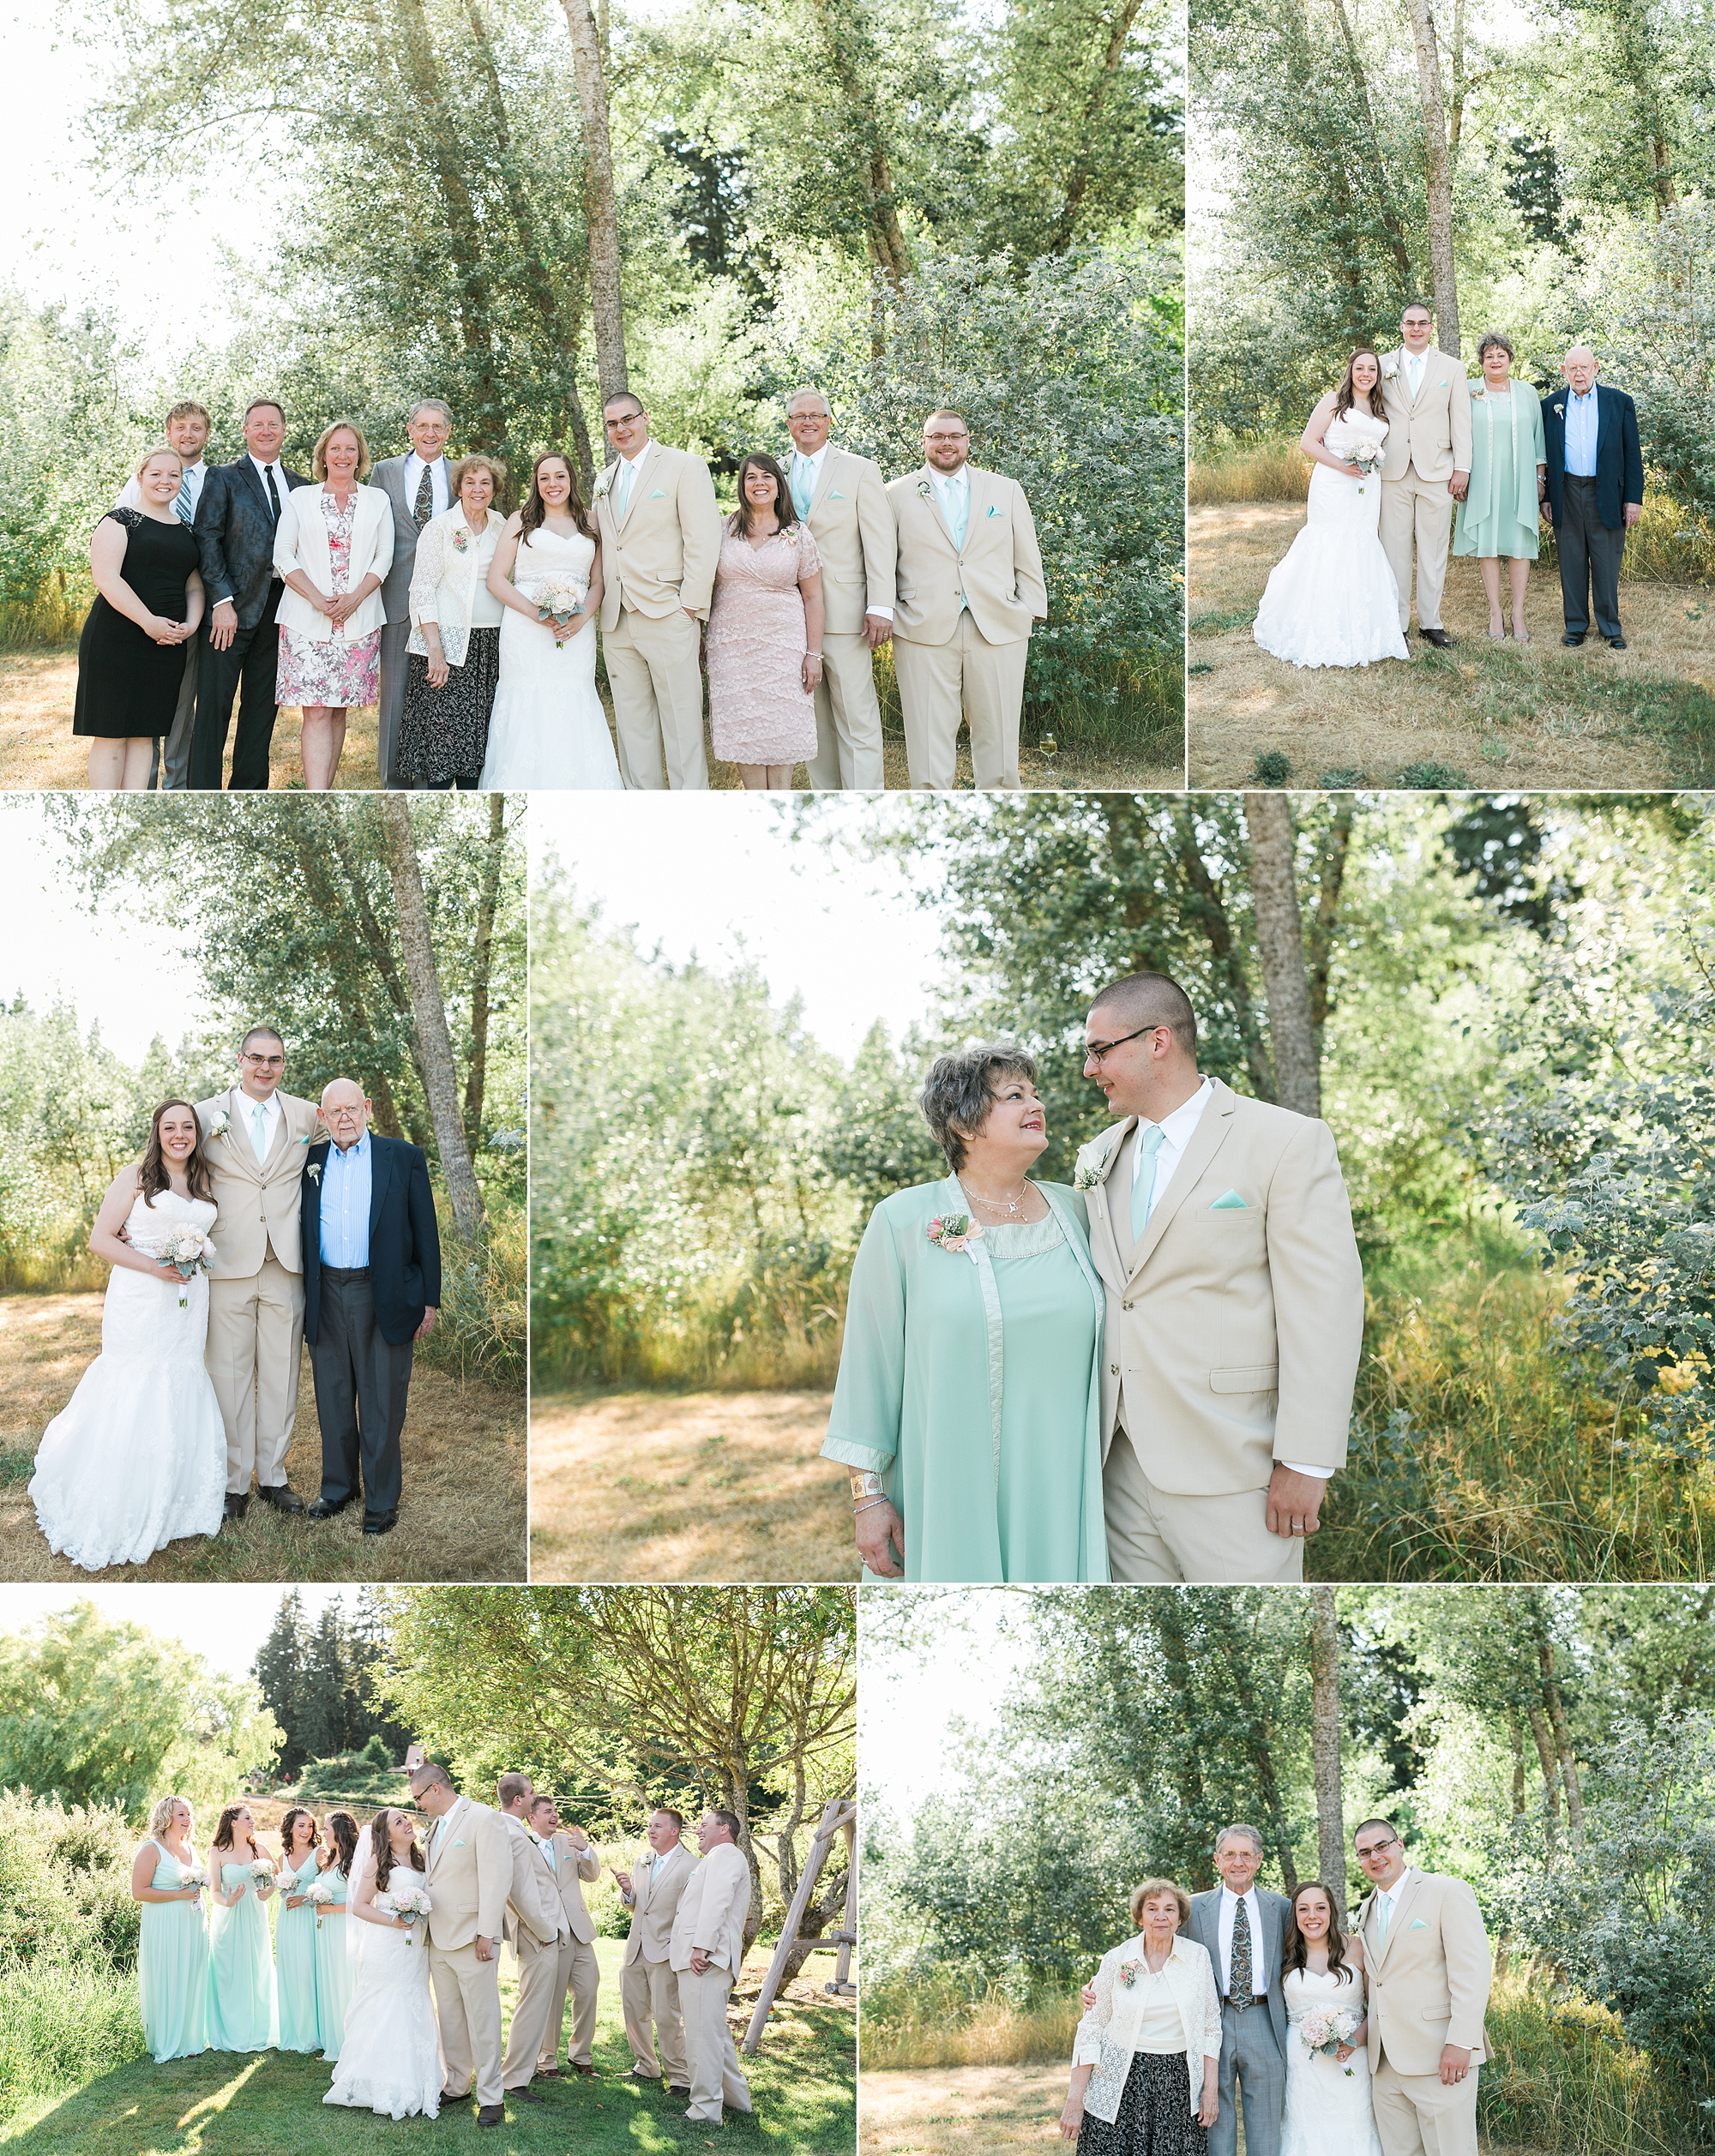 ashley vos photography seattle area wedding photographer_0566.jpg